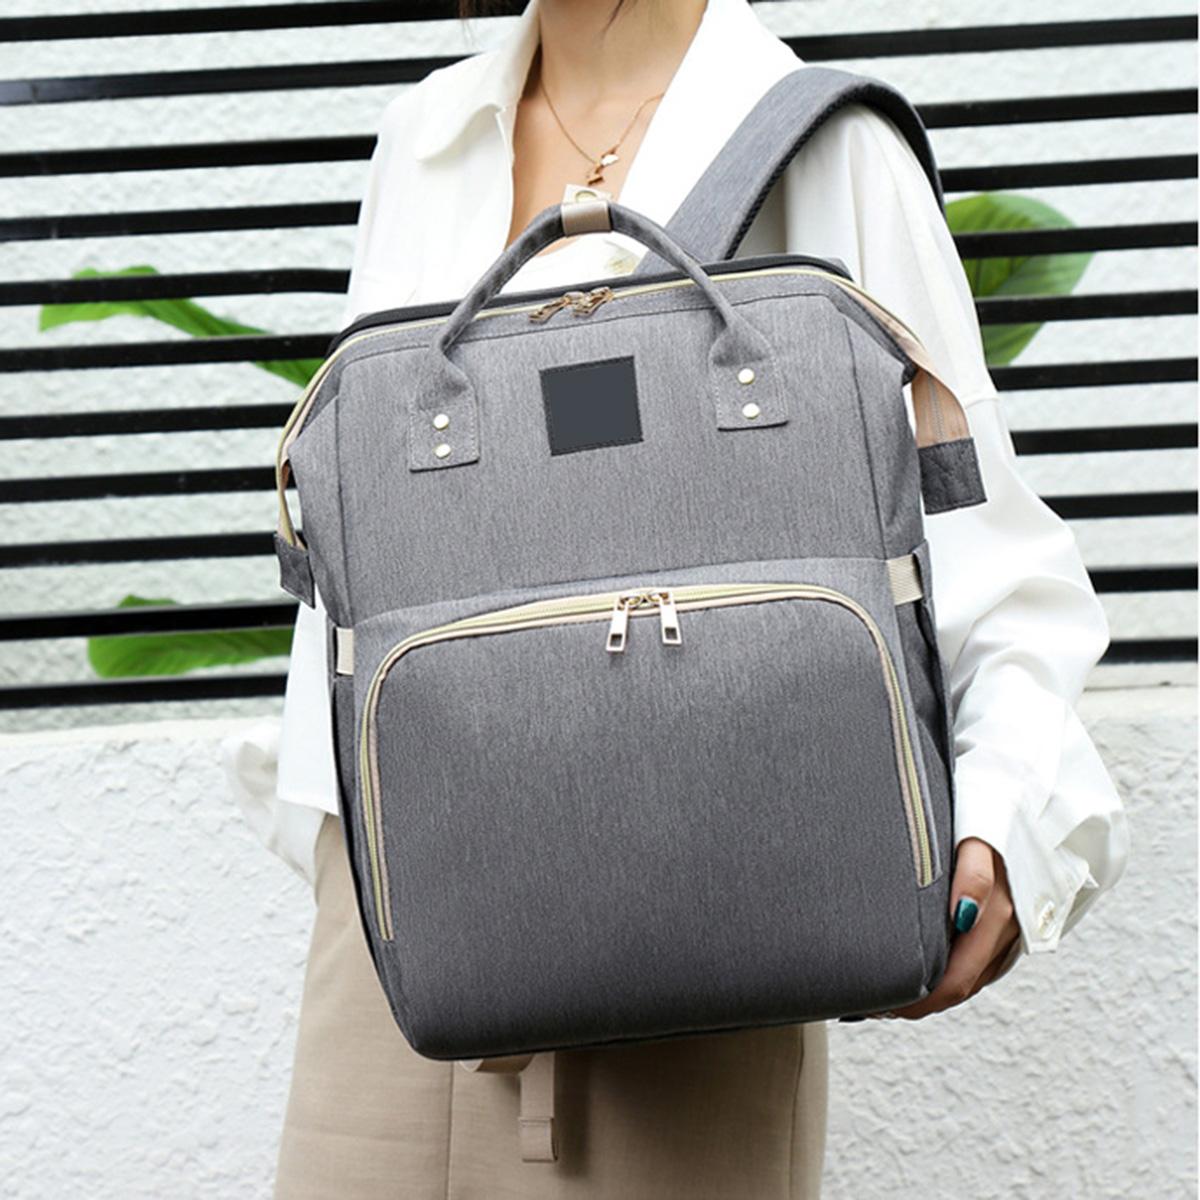 PIcano G14826 2 in 1 Mom Backpack Diaper Bag Multifunctional Baby Bed Crib Handbag Stroller